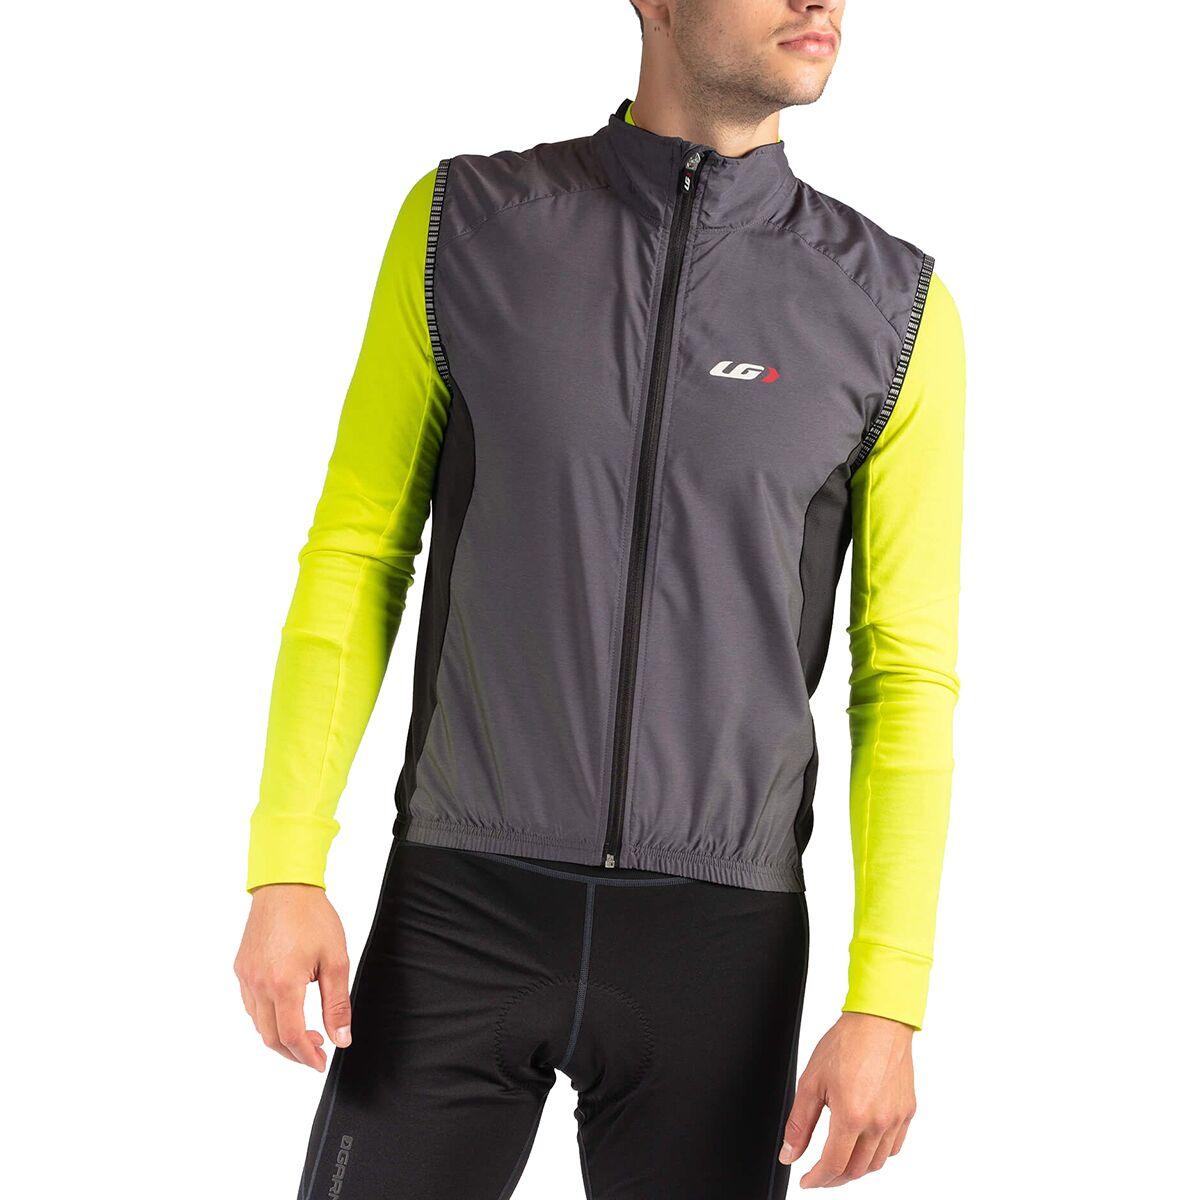 Baisky Sportswear-Cycling Vest-Suit Design-Sanity Gray T2209B